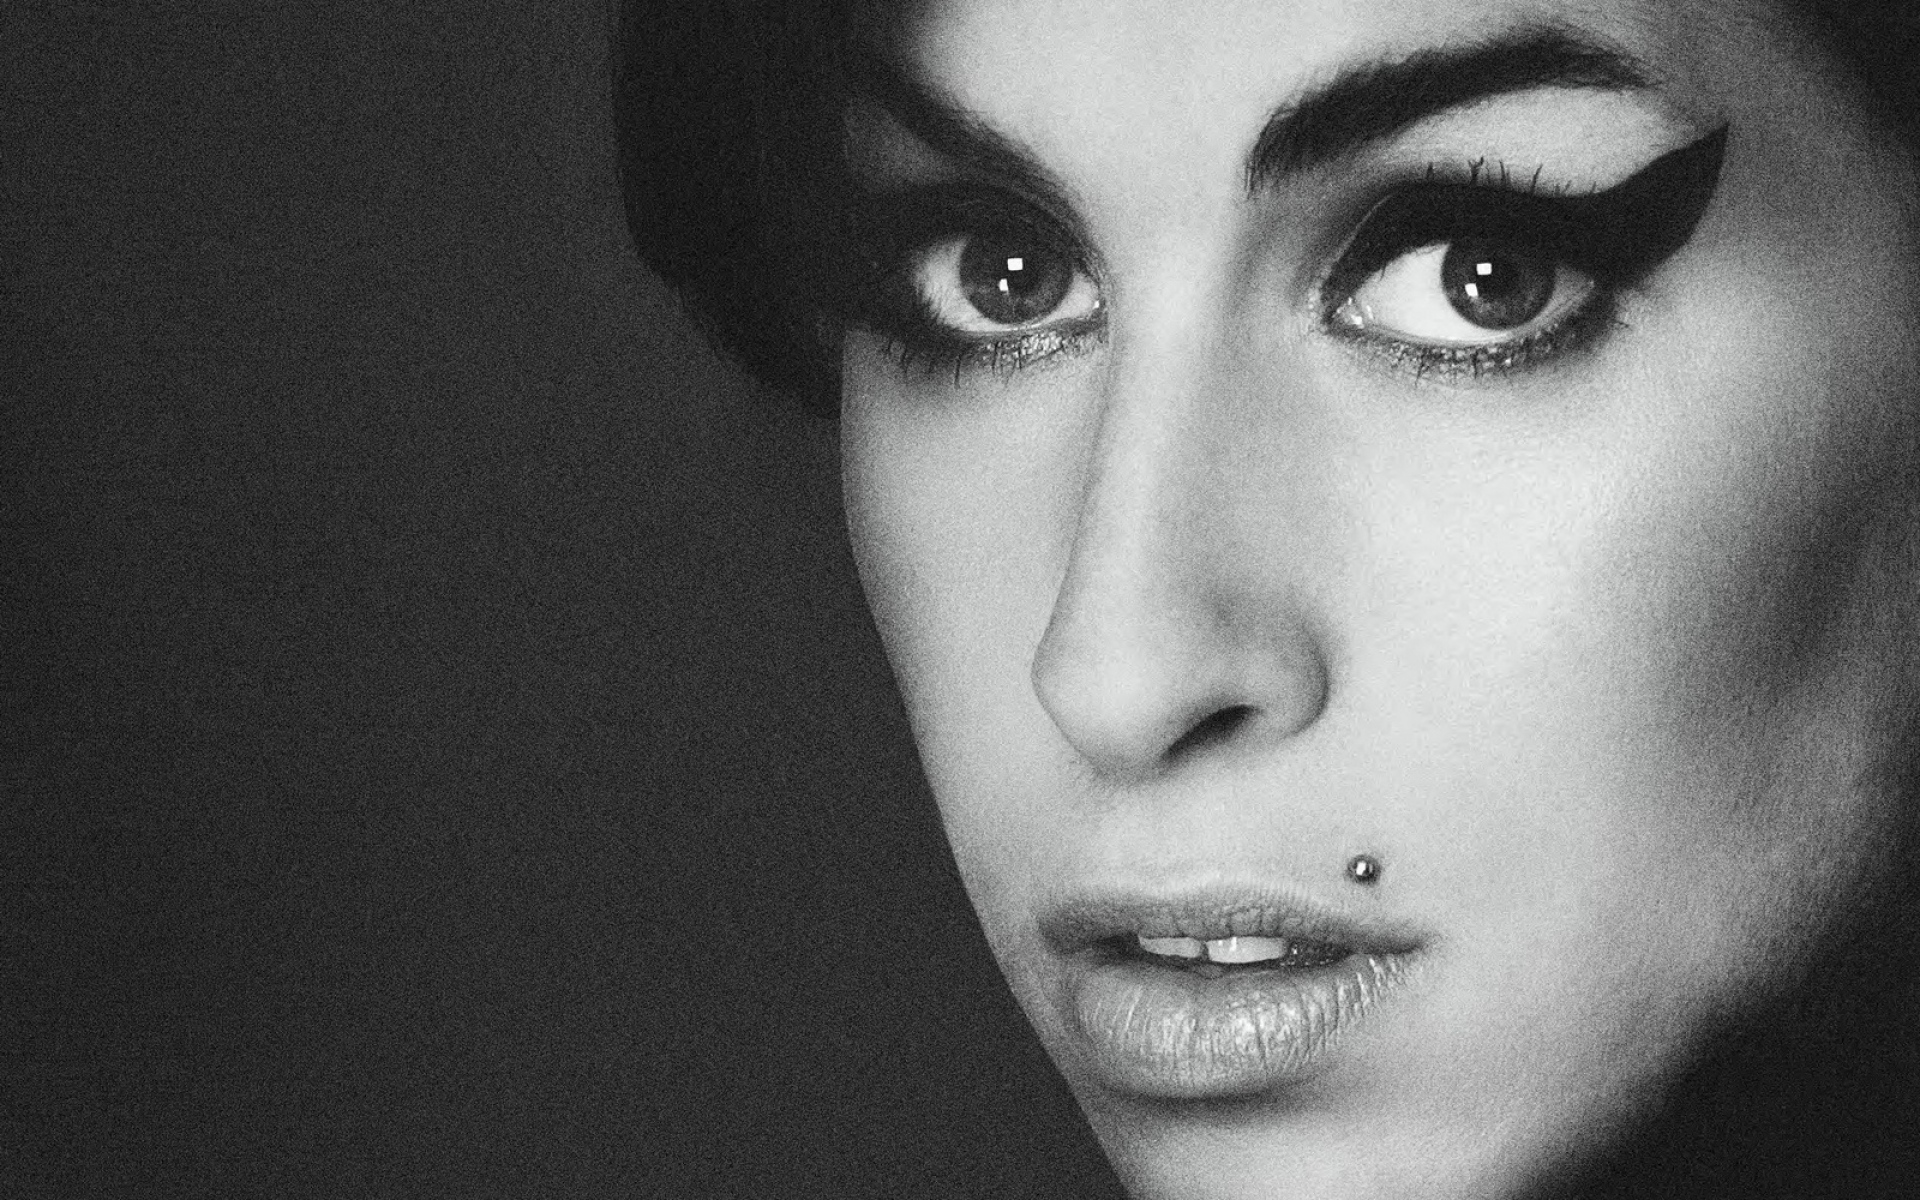 Amy-Winehouse-Wallpapers-1920x1200.jpg